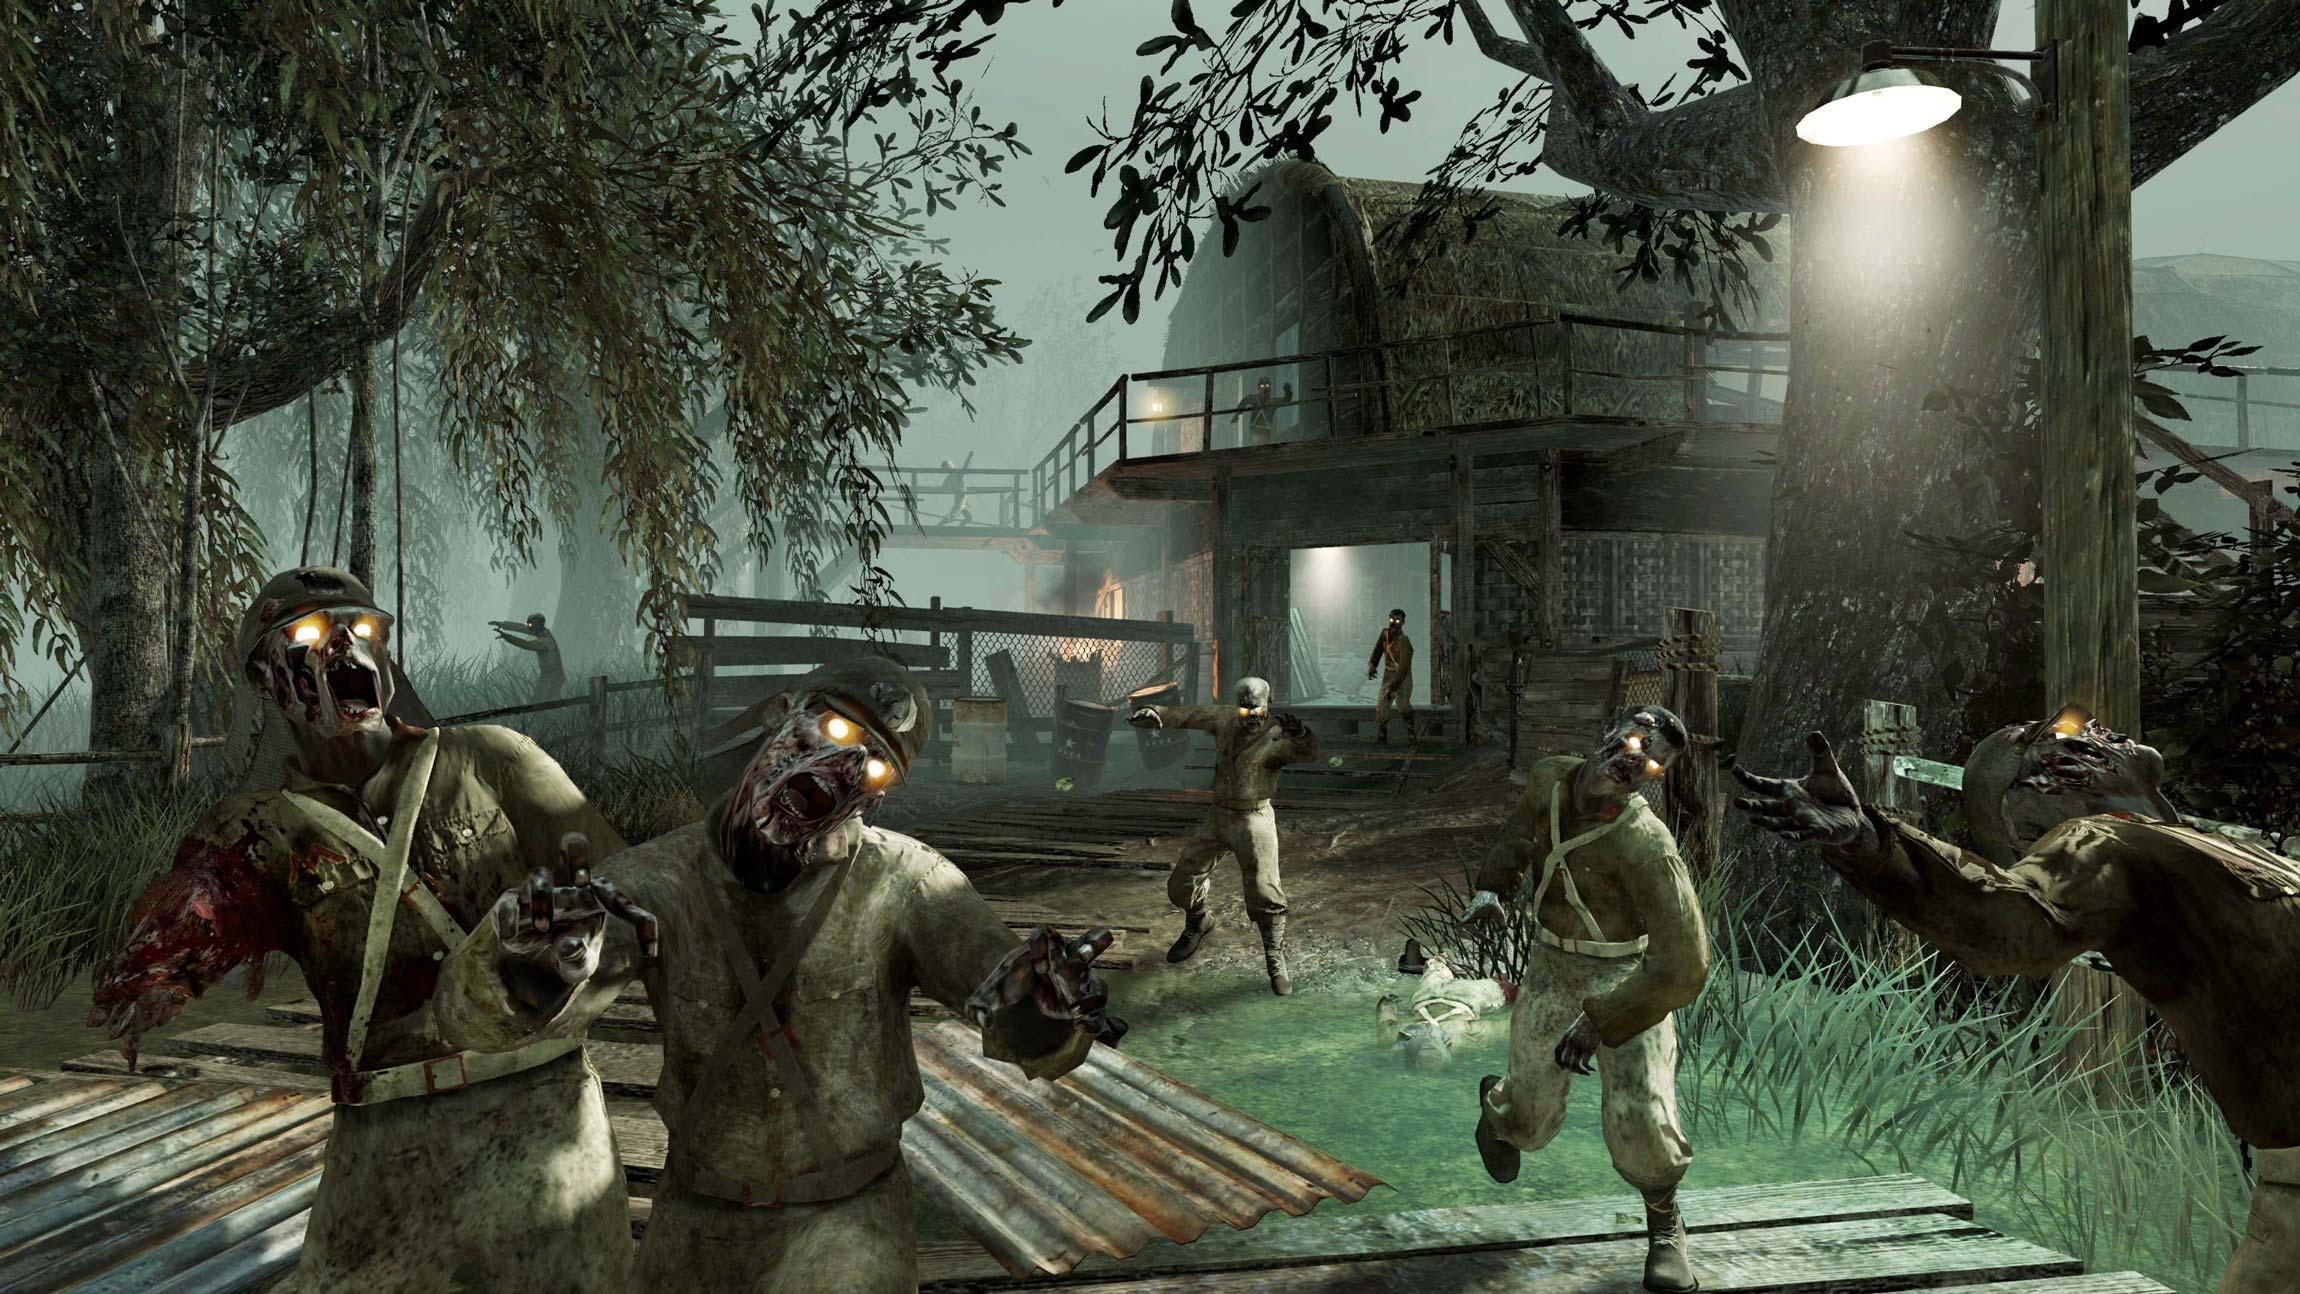 Call of Duty Zombies Wallpapers  WallpaperSafari